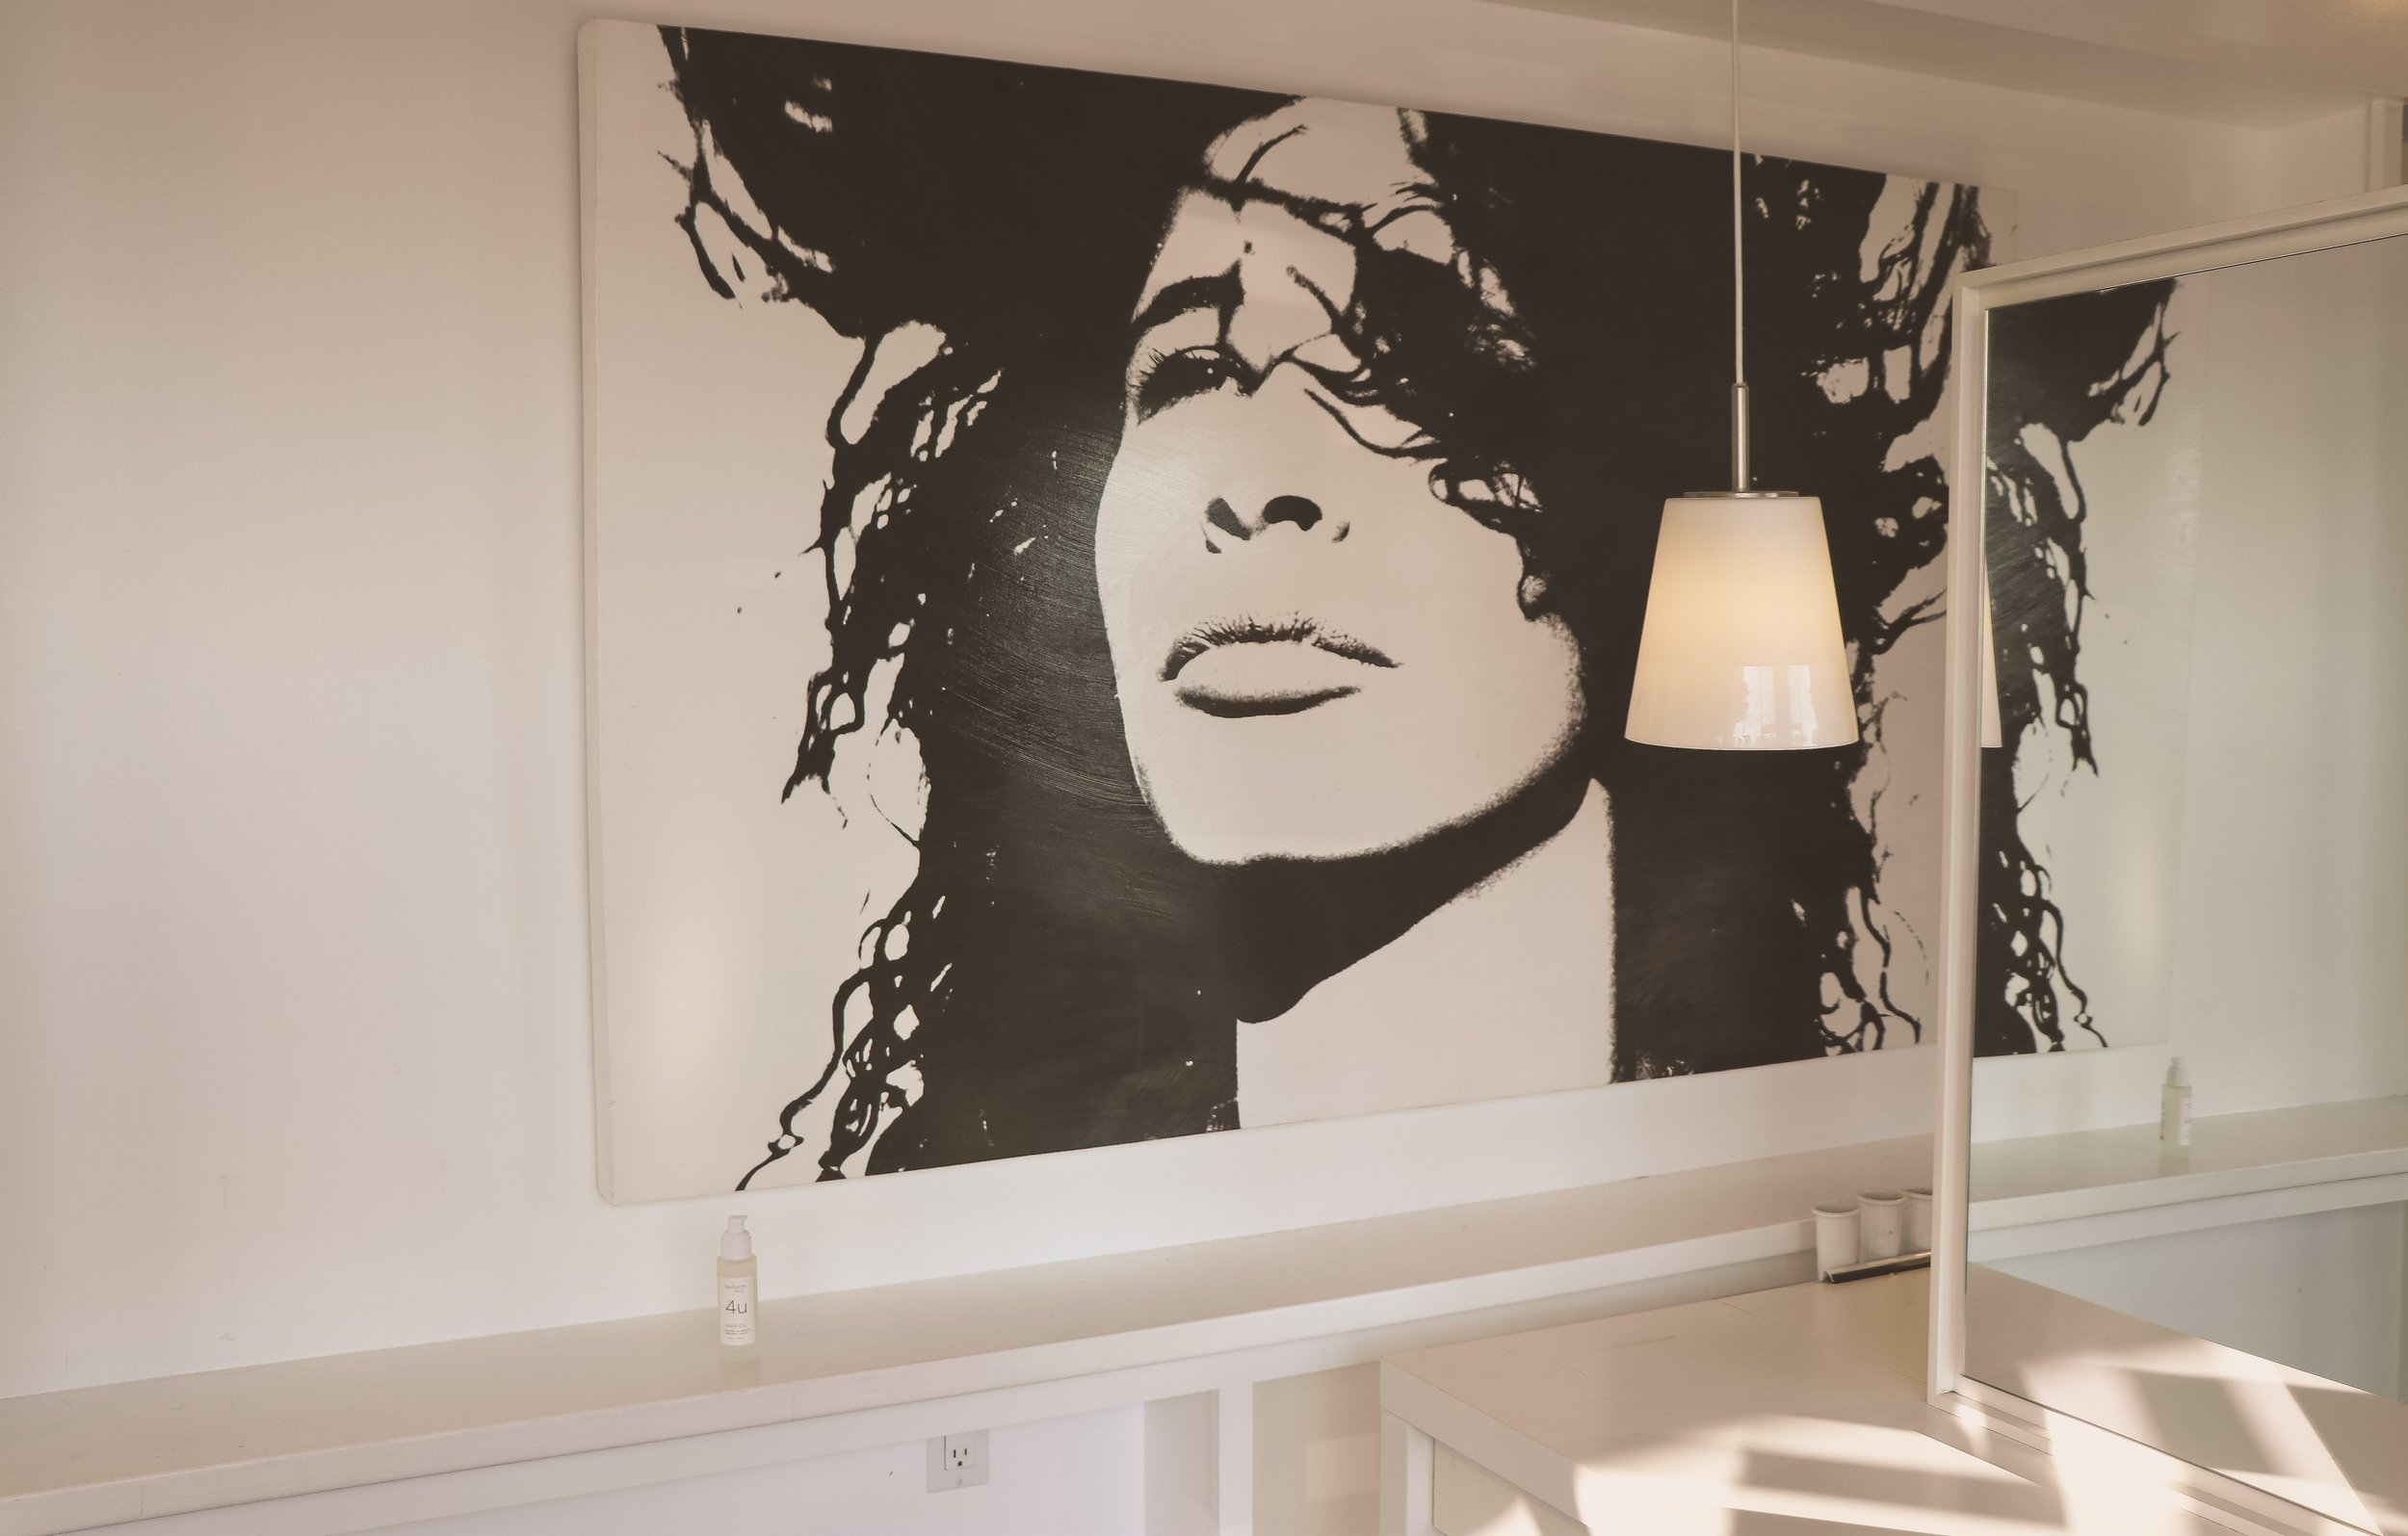 art-ceiling-floor-762800.jpg